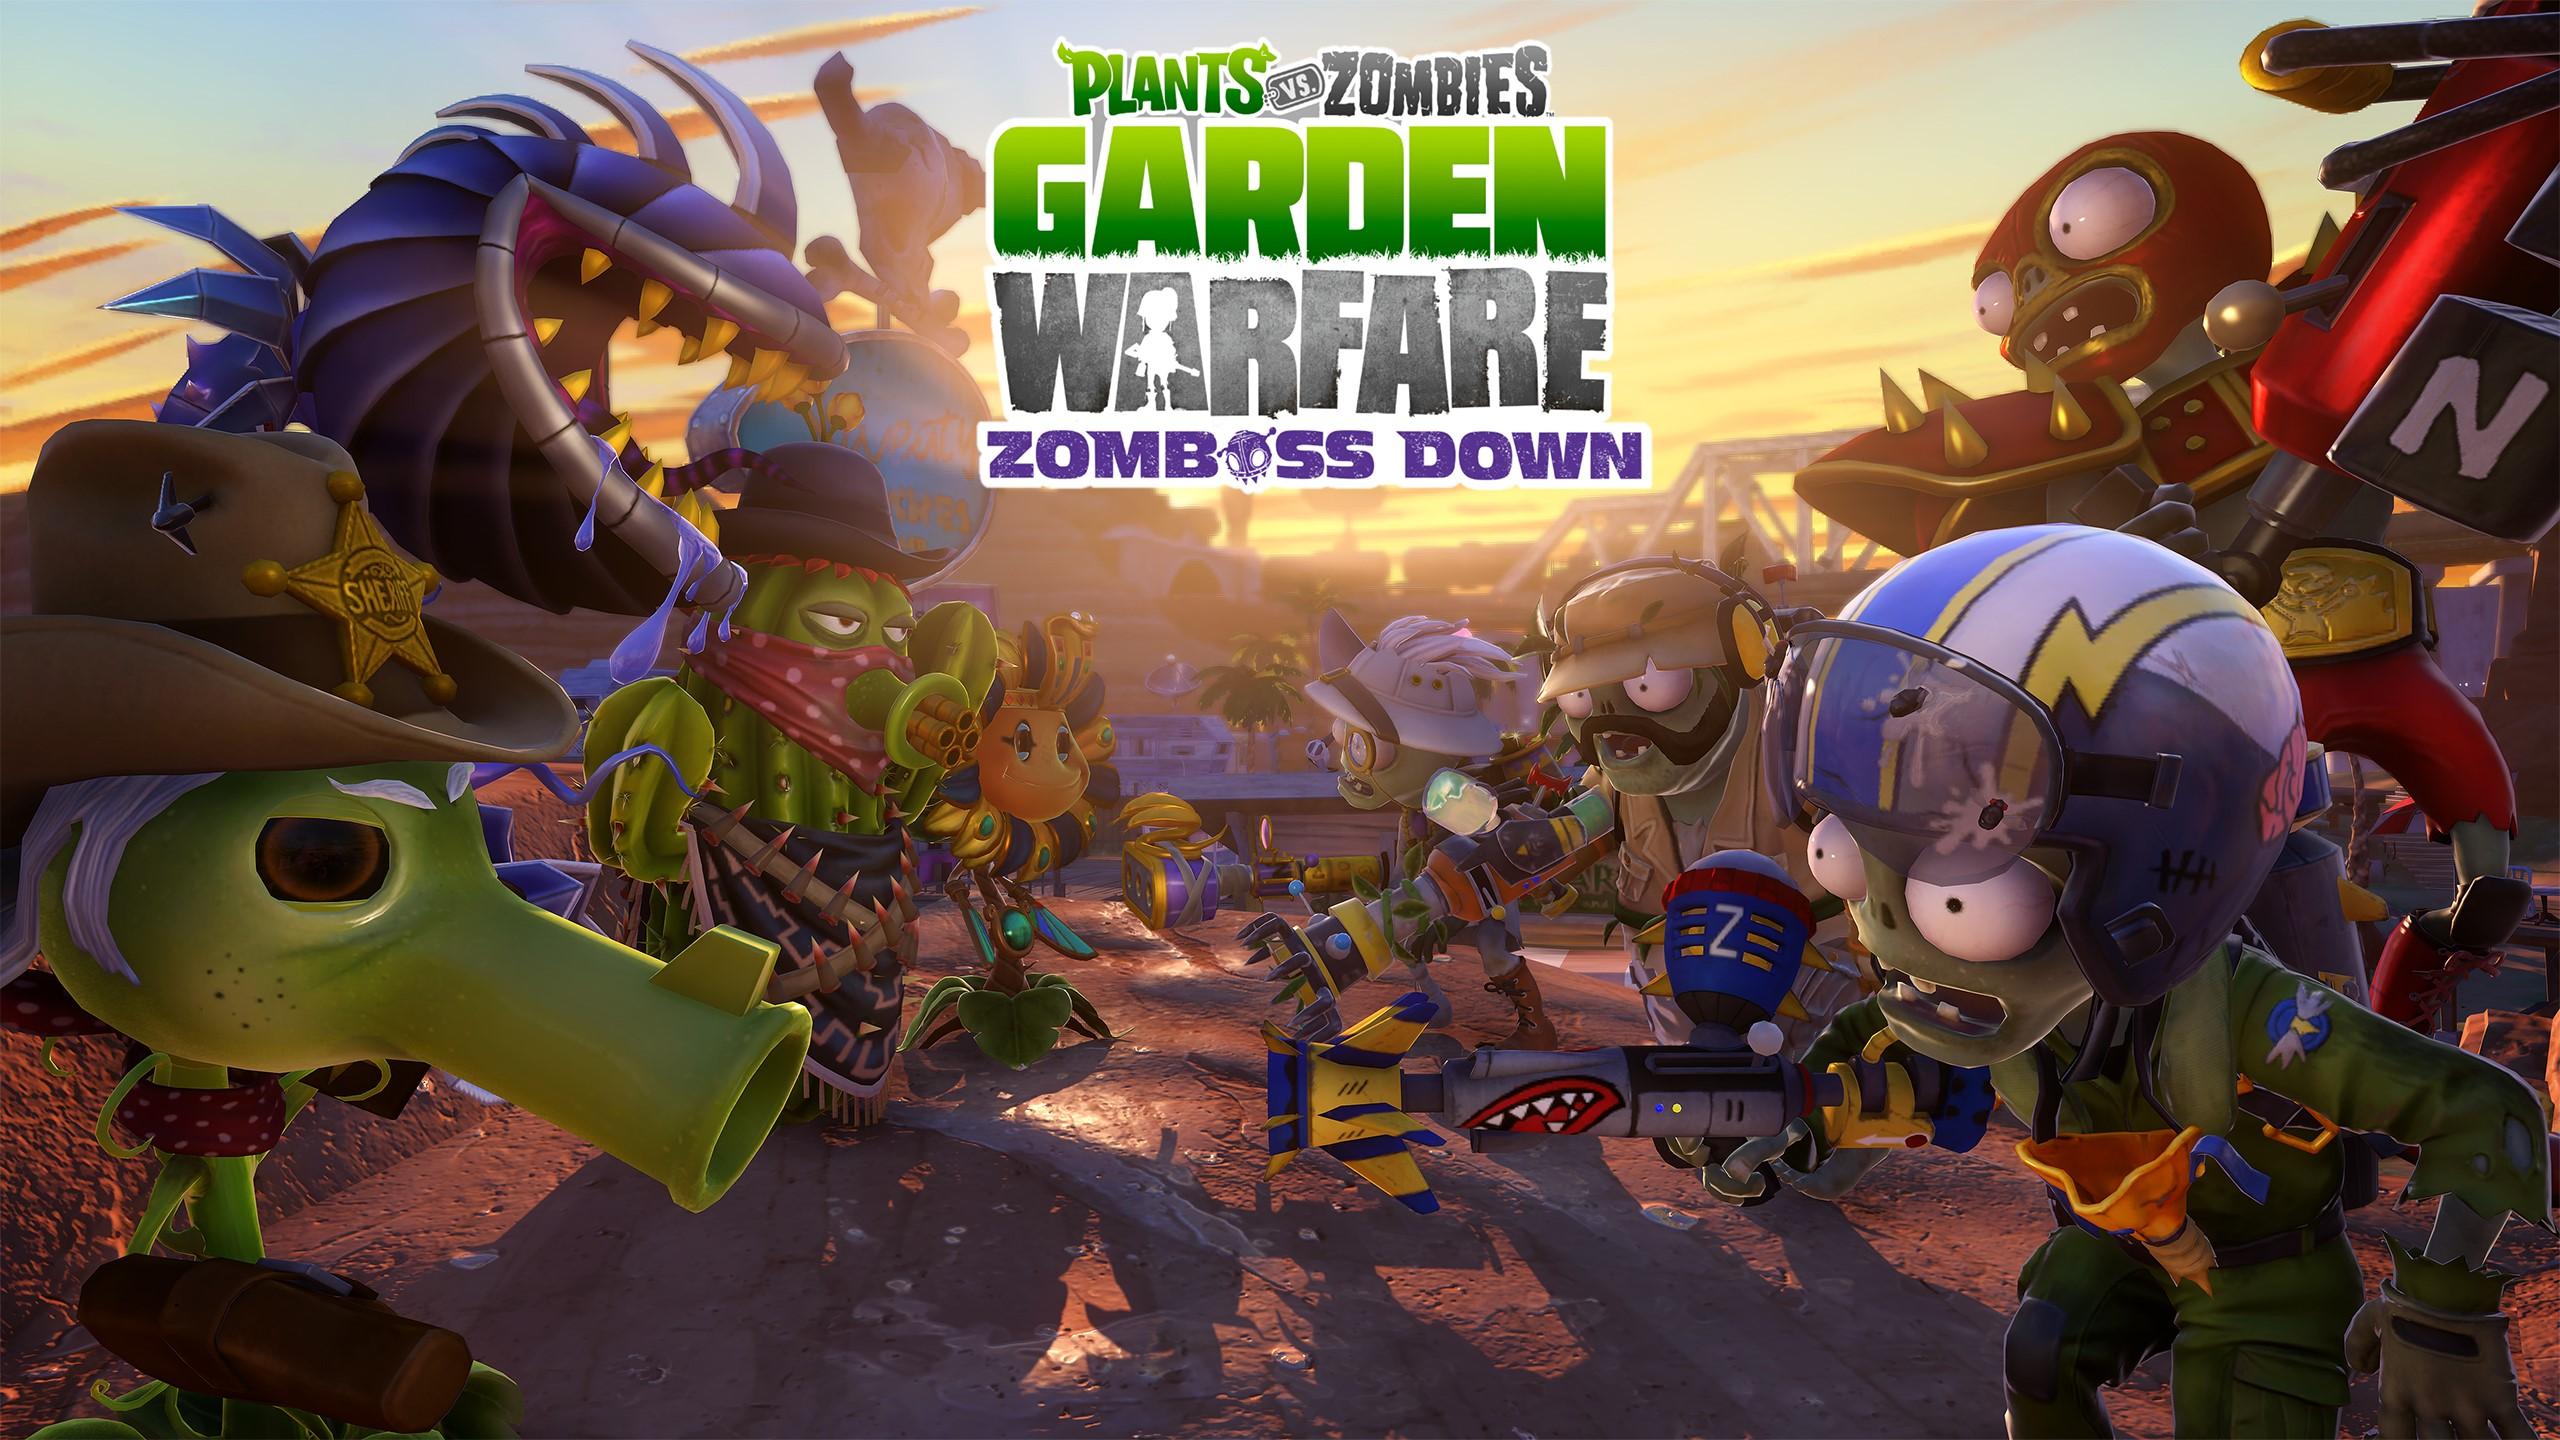 Buy Plants vs Zombies Garden Warfare [GUARANTEE]🔥 and download